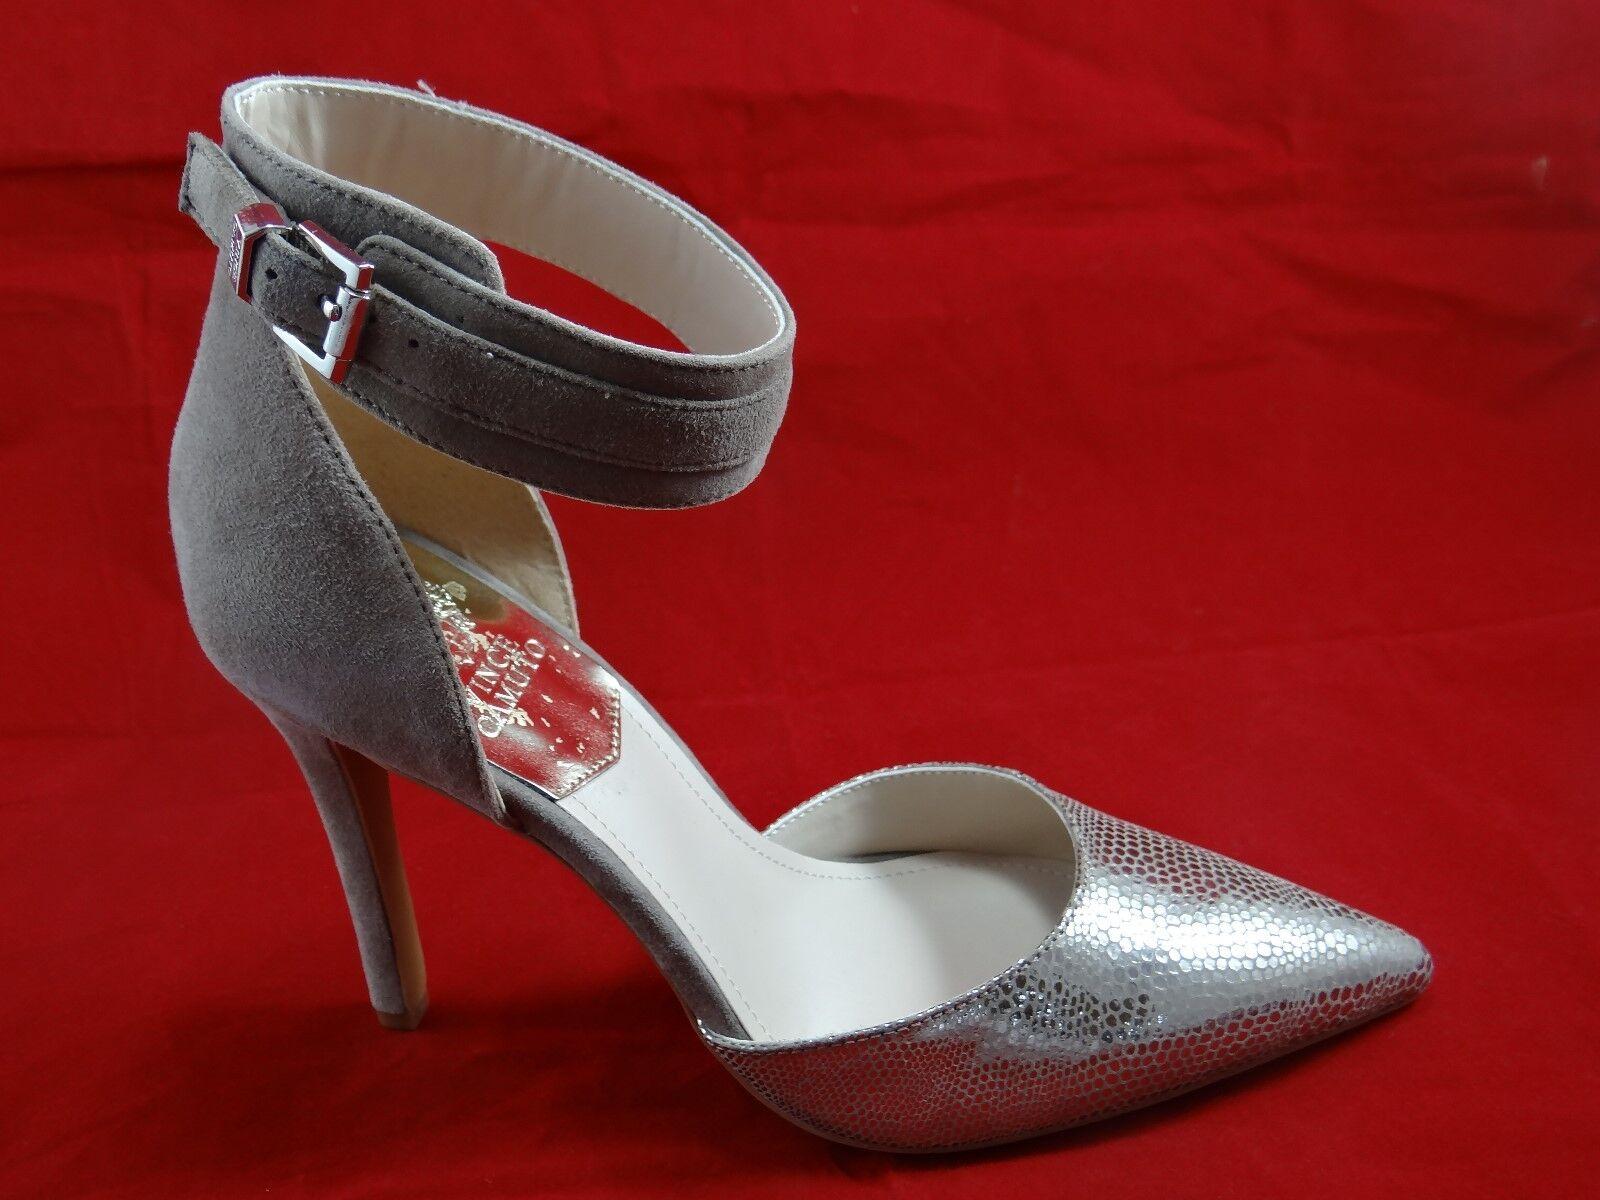 Vince Camuto Lyla Pointed  Leder Ankle Strap Pointed Lyla Toe Pumps Heels Schuhes Tan Sz 10 0d6248